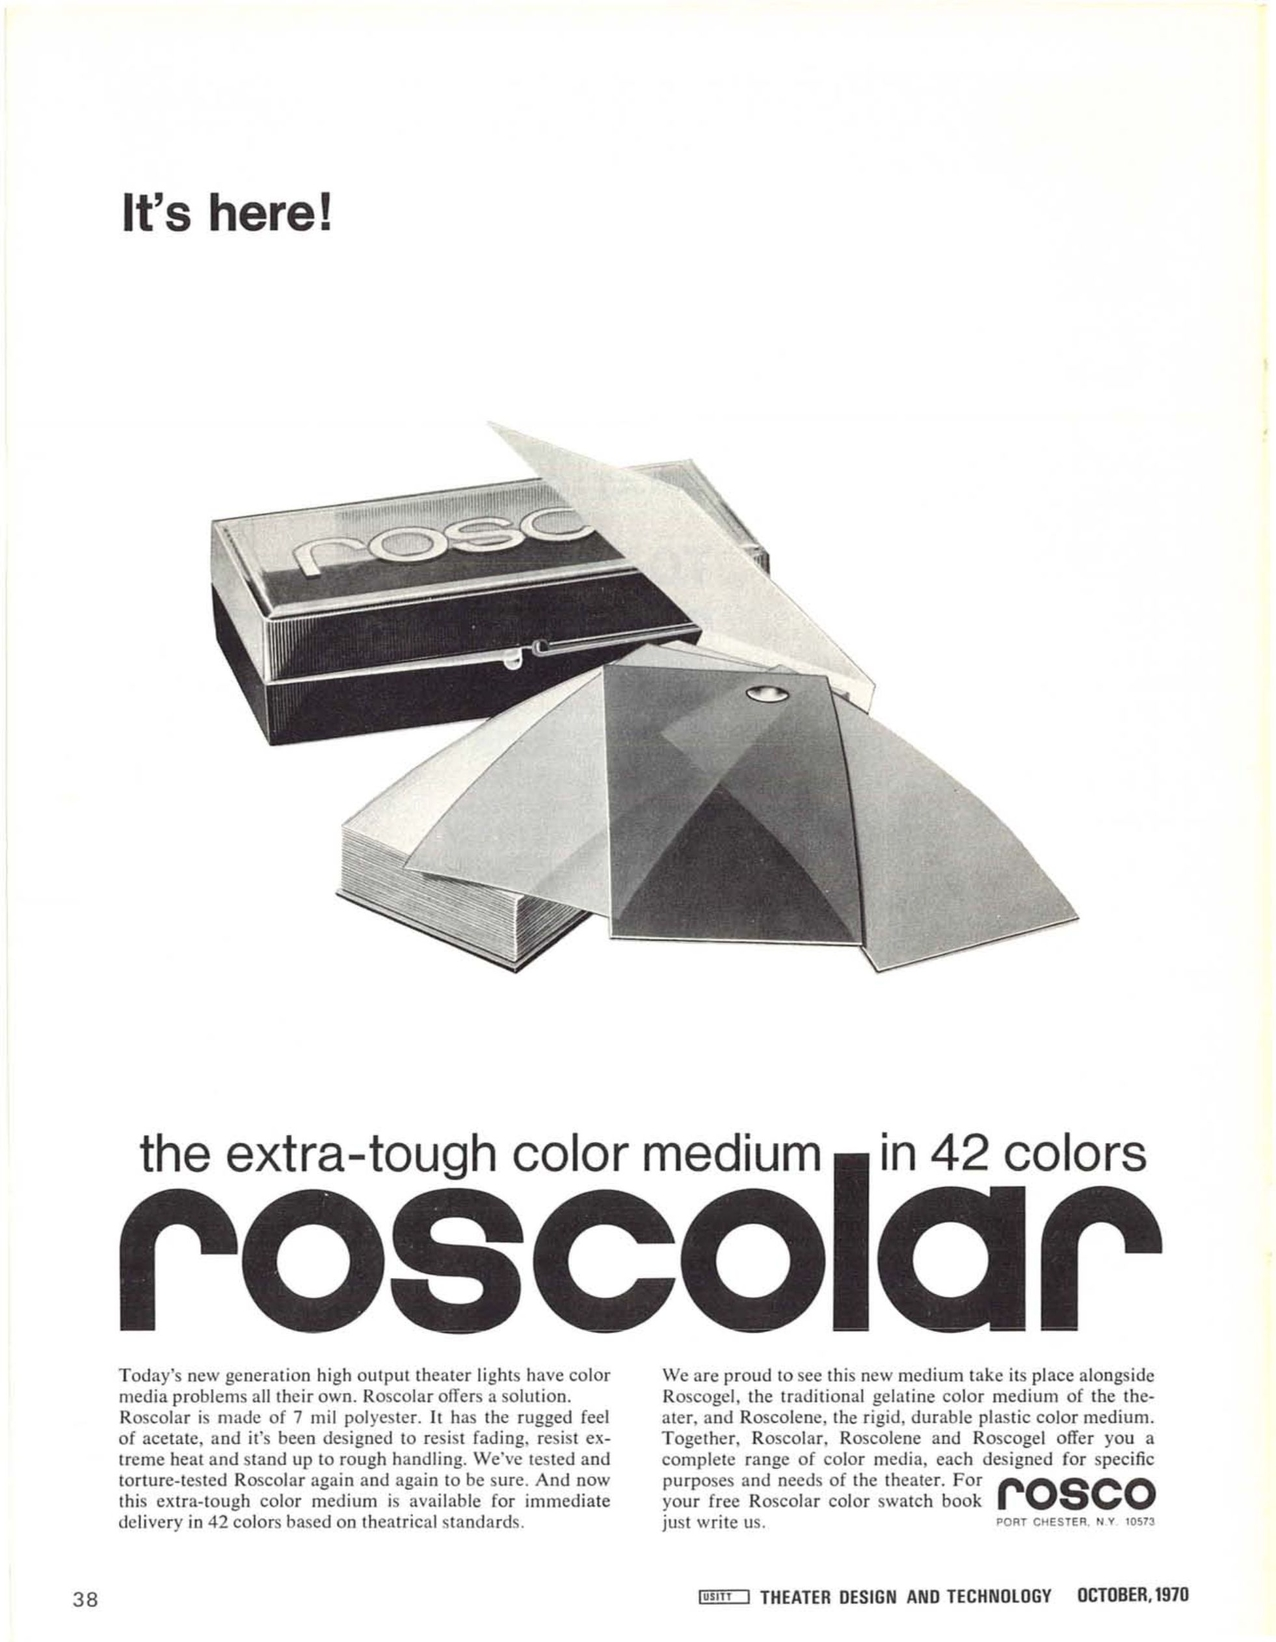 Theatre Design & Technology - Oct 1970